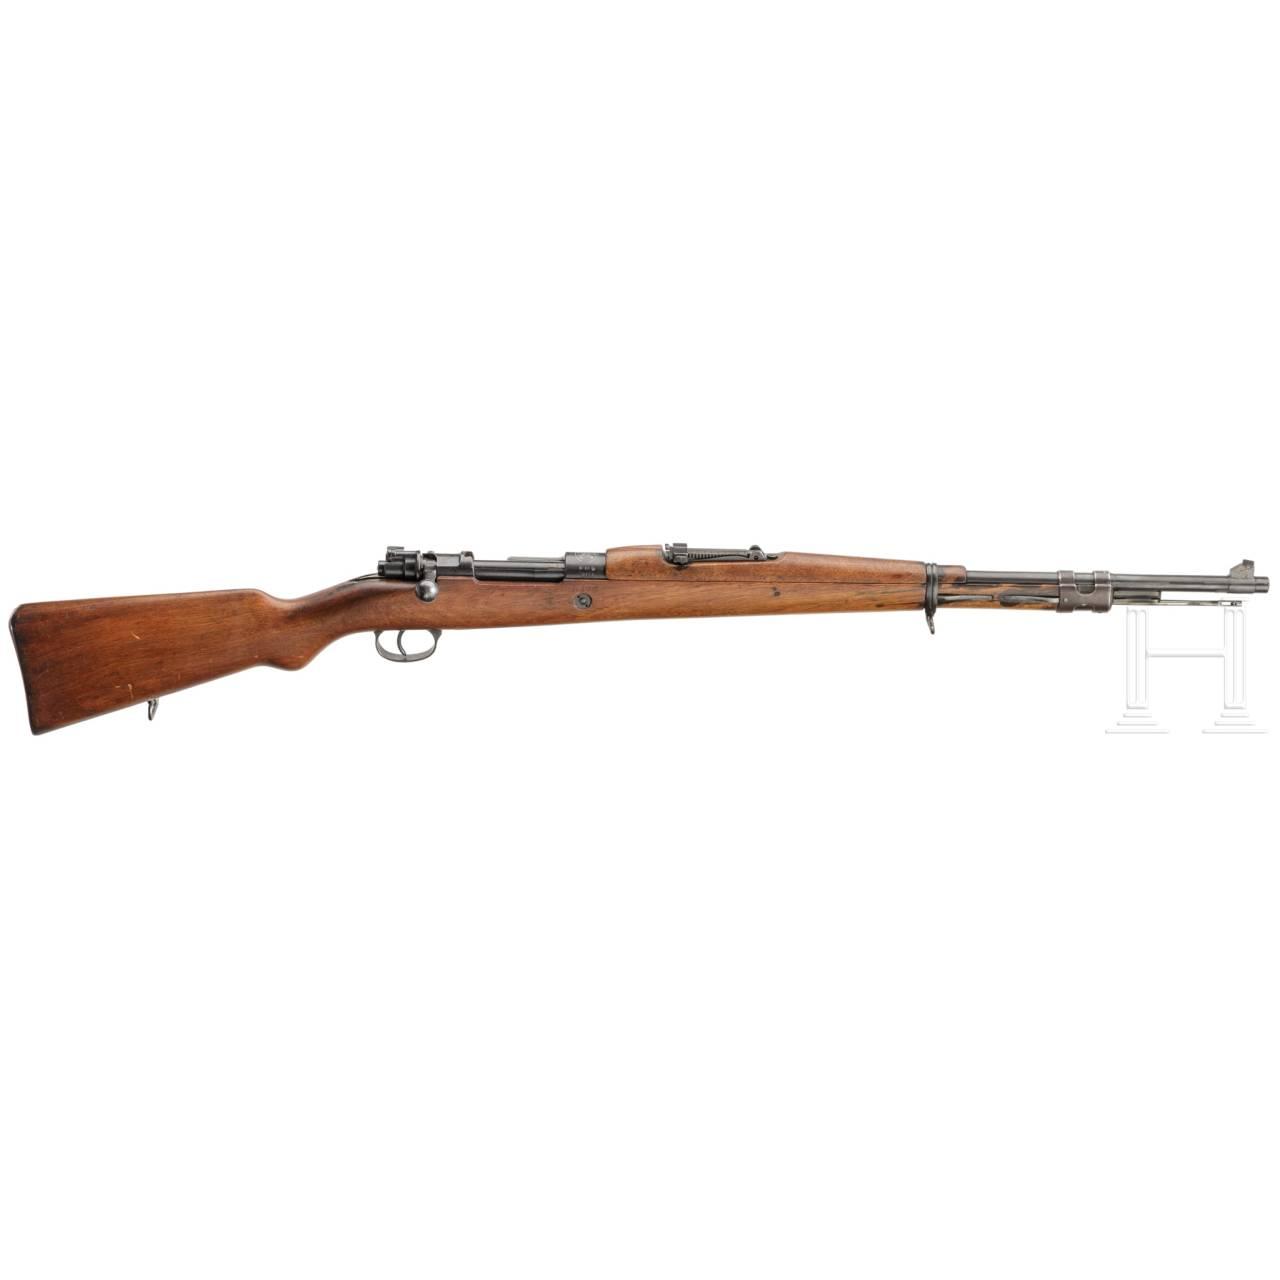 Belgien - Kurzgewehr FN Mod. 1930